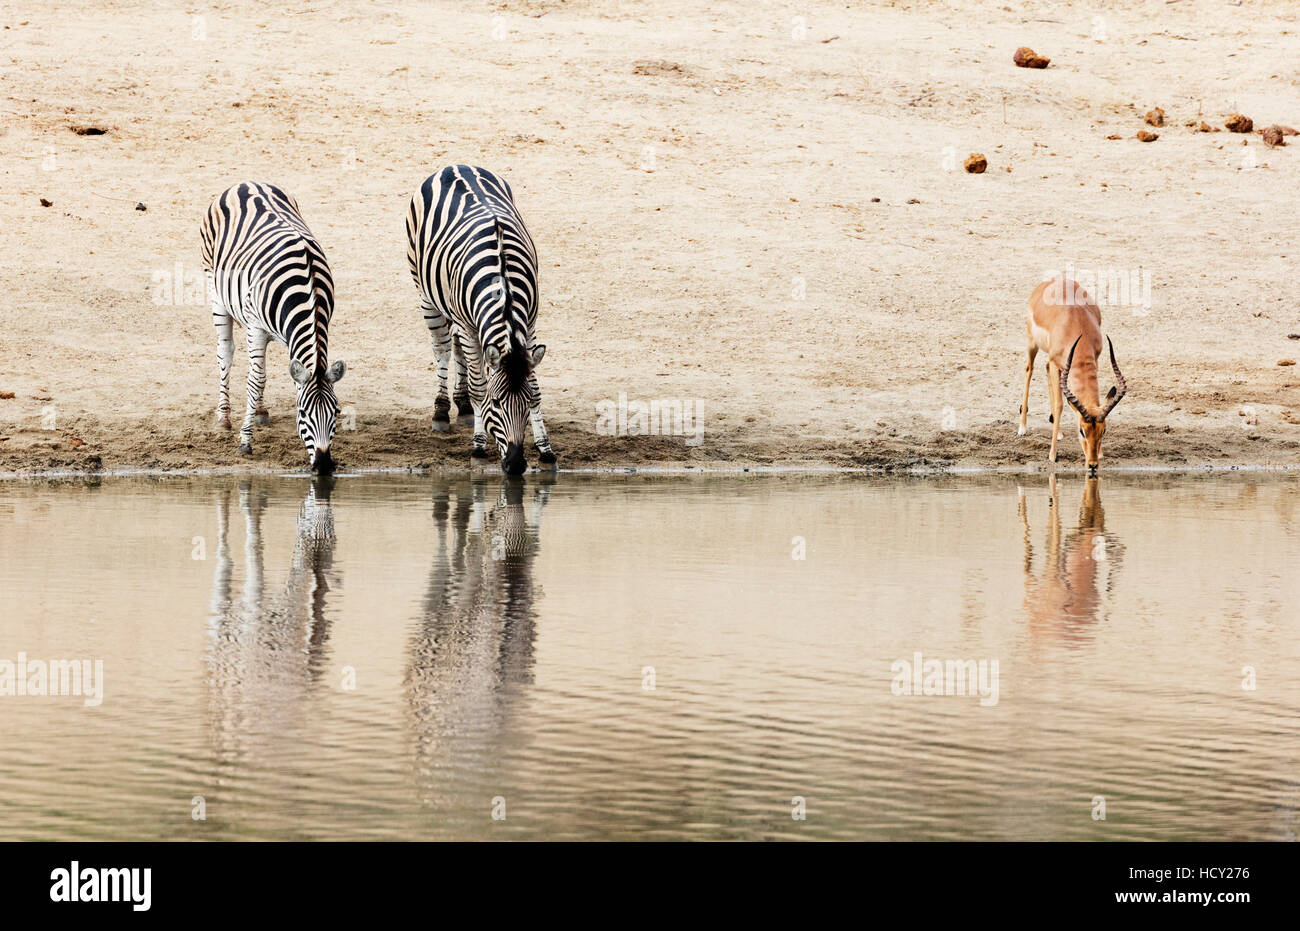 Burchell's Plains zebra (Equus quagga) drinking, Kruger National Park, South Africa, Africa - Stock Image